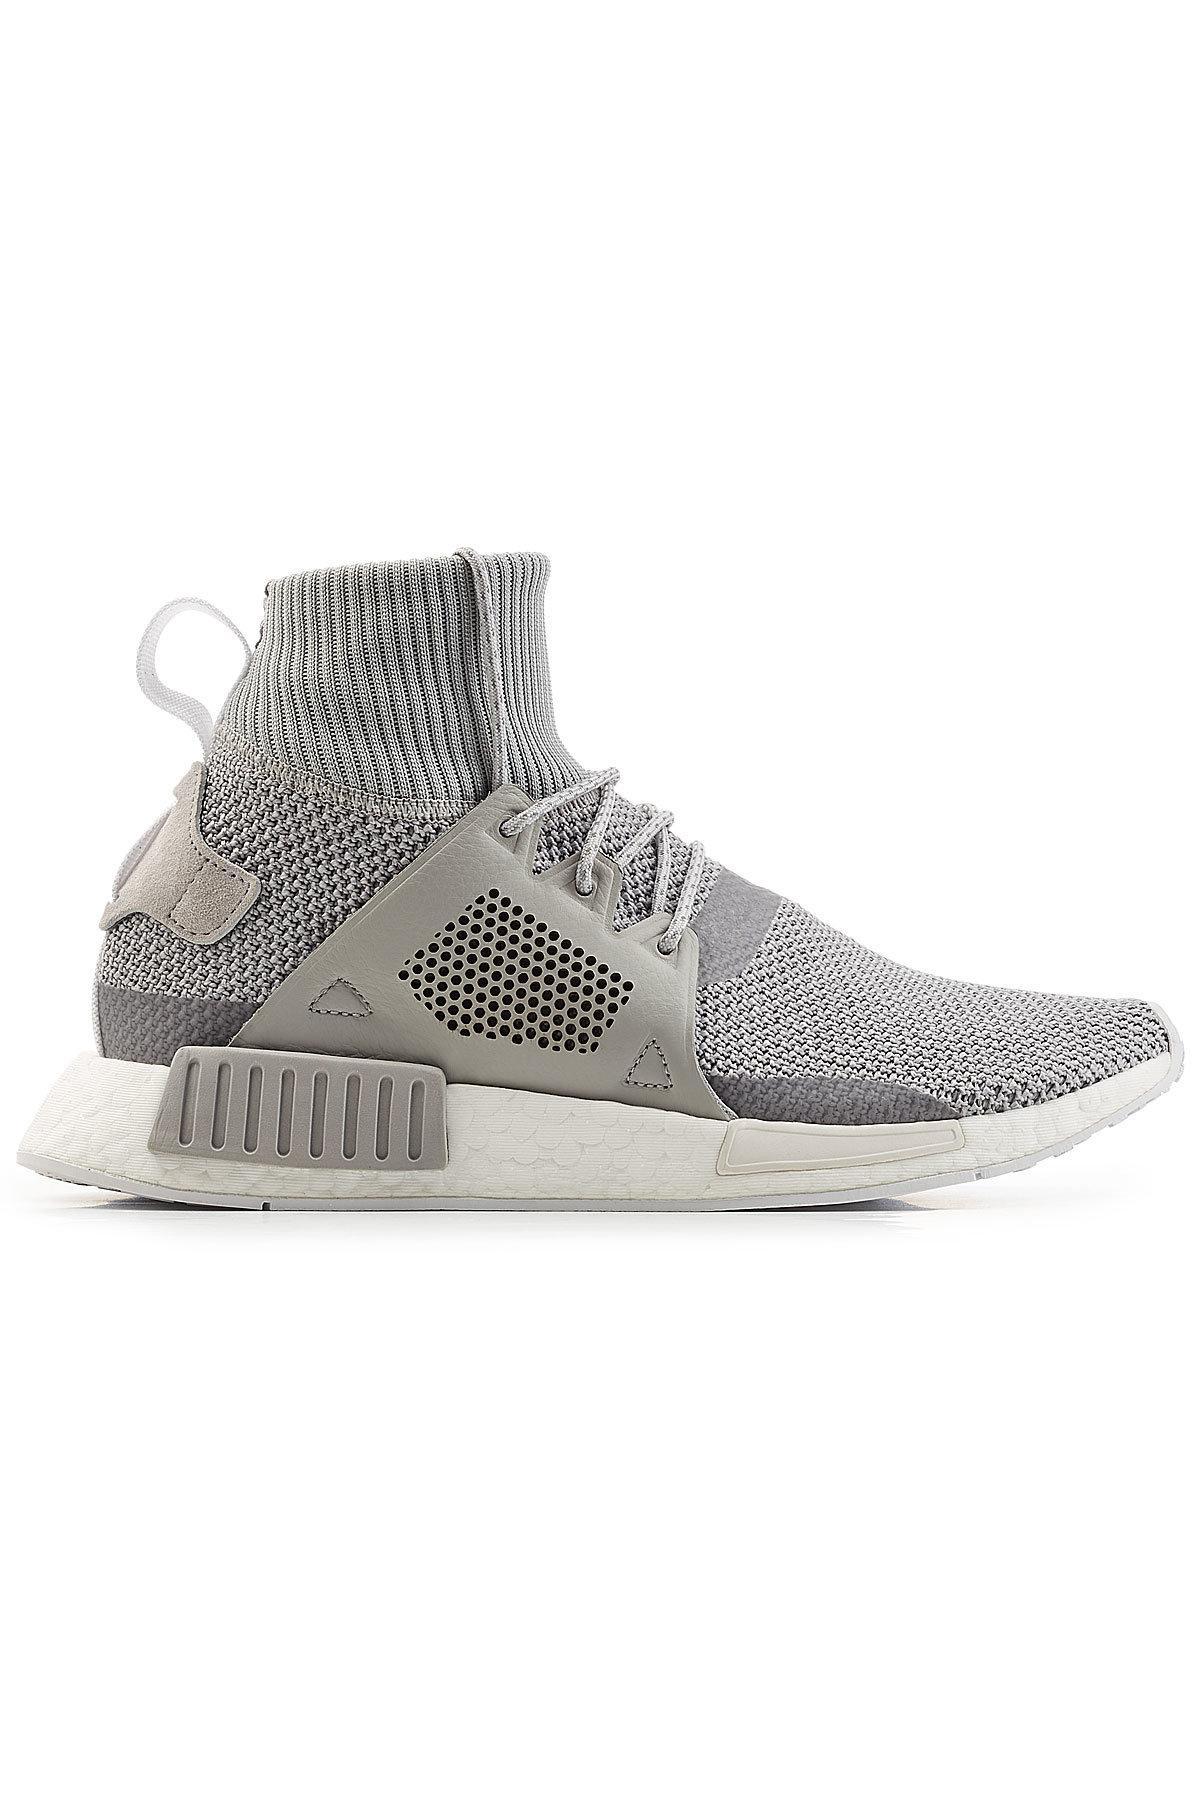 c7b3a7d50611 Adidas Originals - Gray Nmd R2 Primeknit Sneakers for Men - Lyst. View  fullscreen